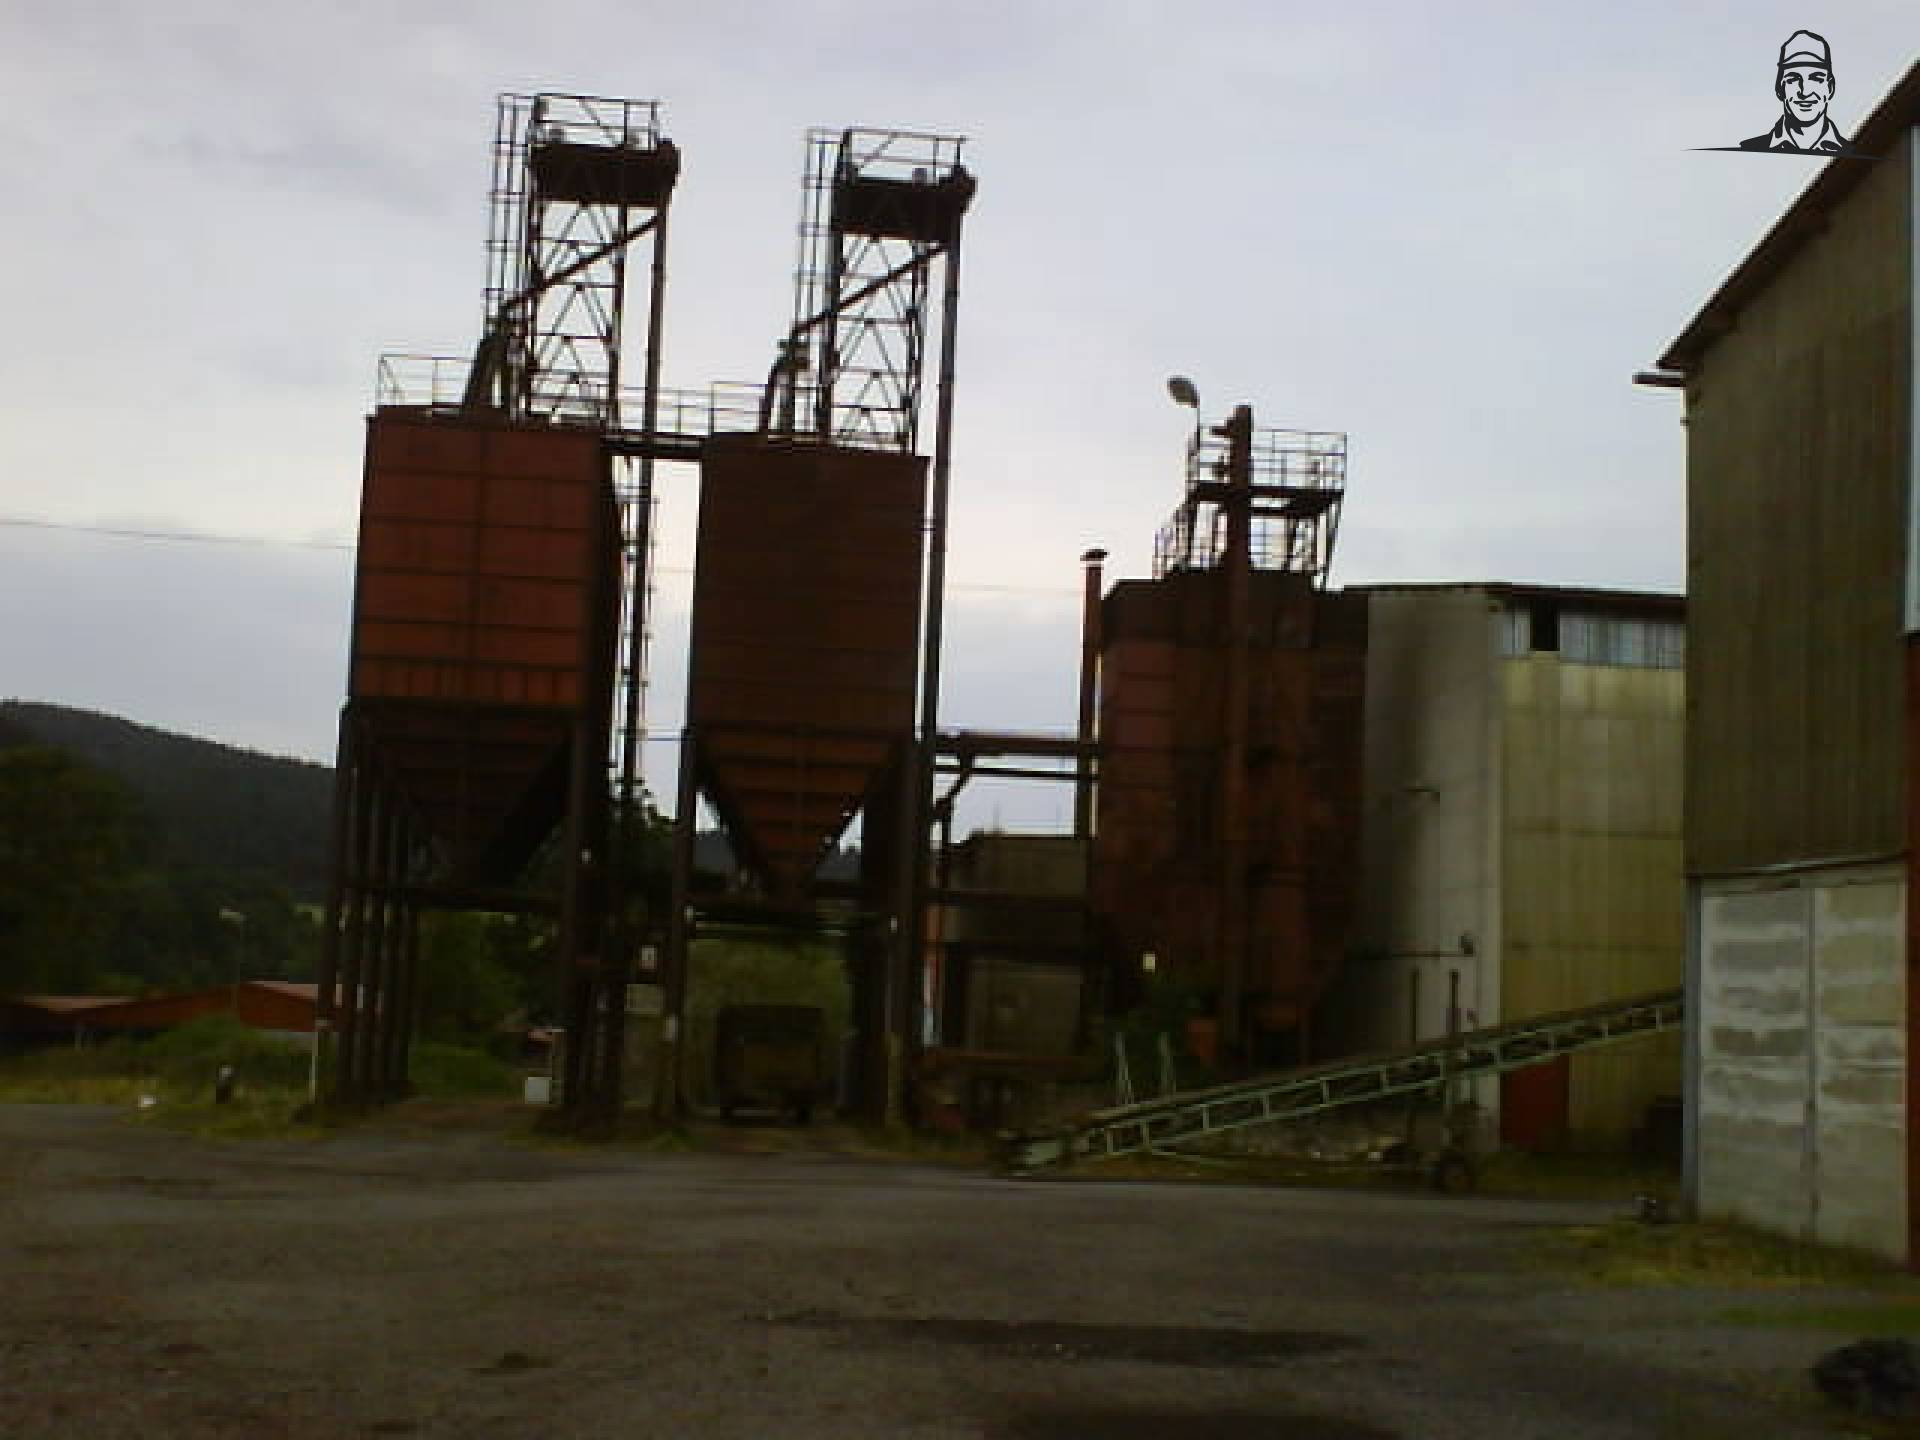 Graan silo's van ekenhorsie